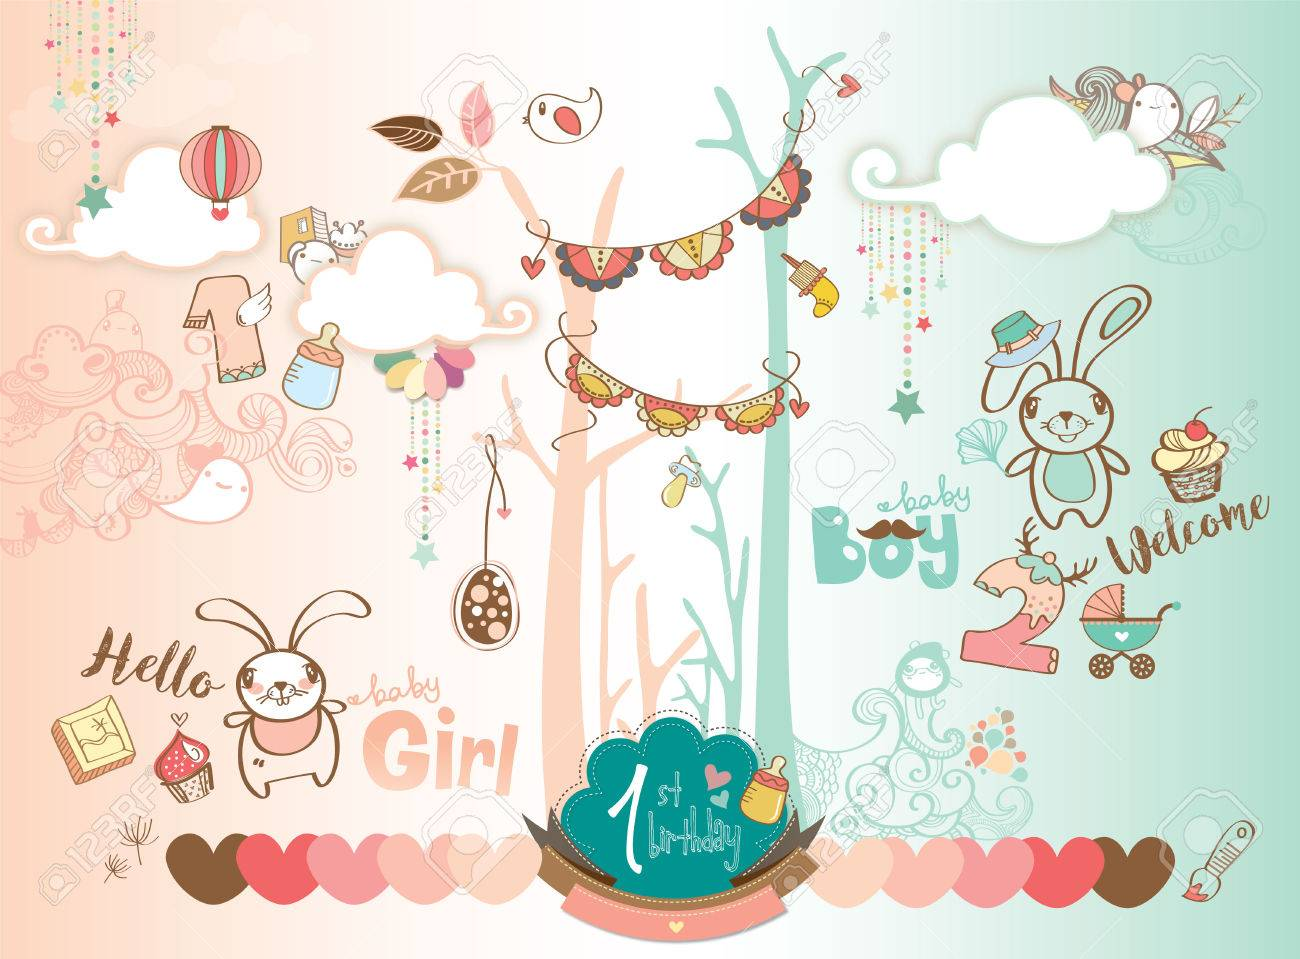 cute baby boy and girl 1st birthday celebration background design